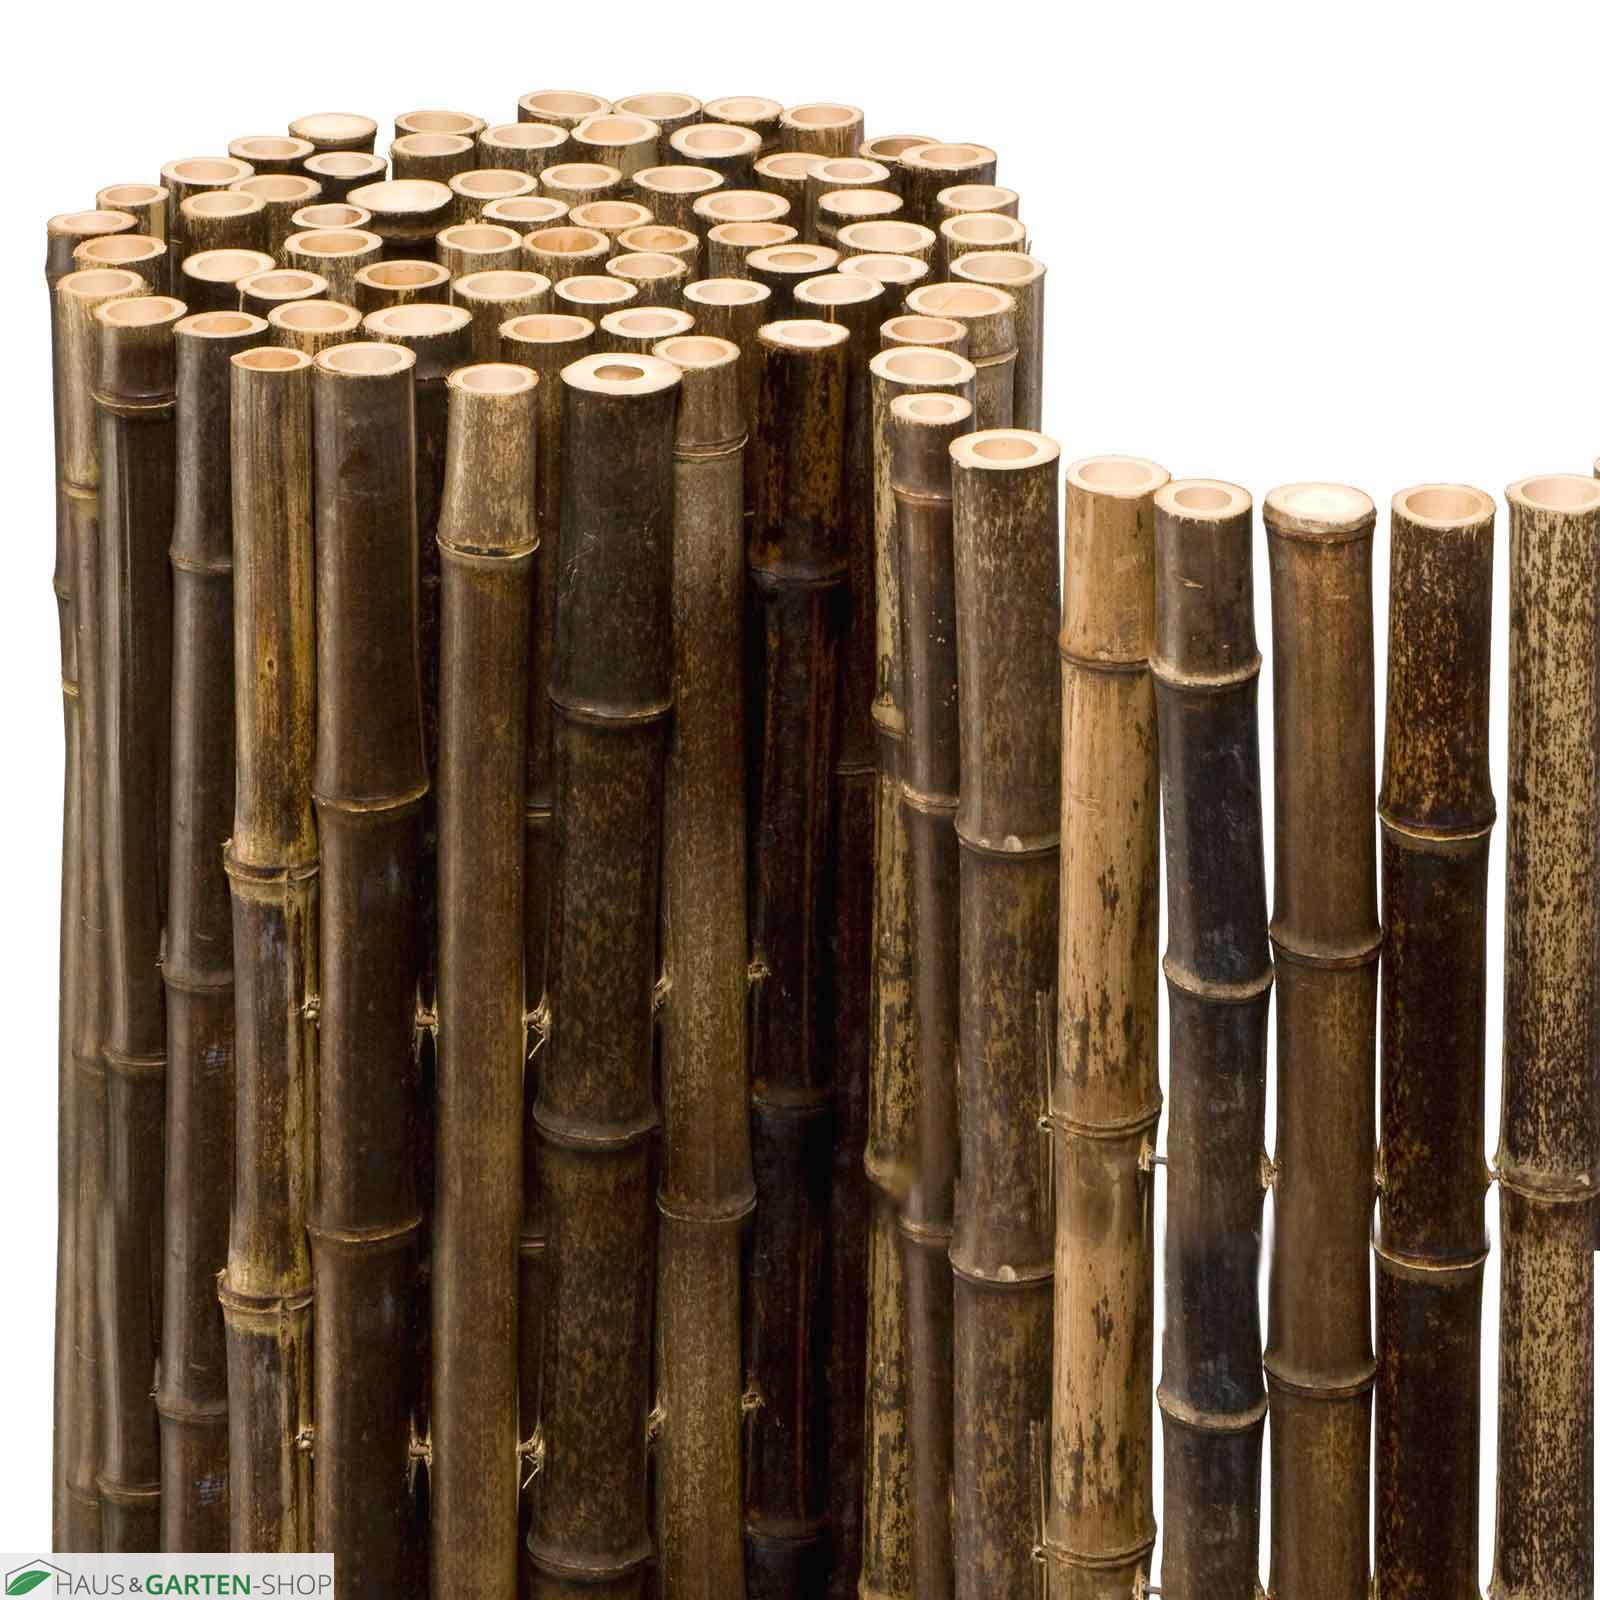 noor bambusmatte kapstadt black edition gewachsener naturbambus. Black Bedroom Furniture Sets. Home Design Ideas